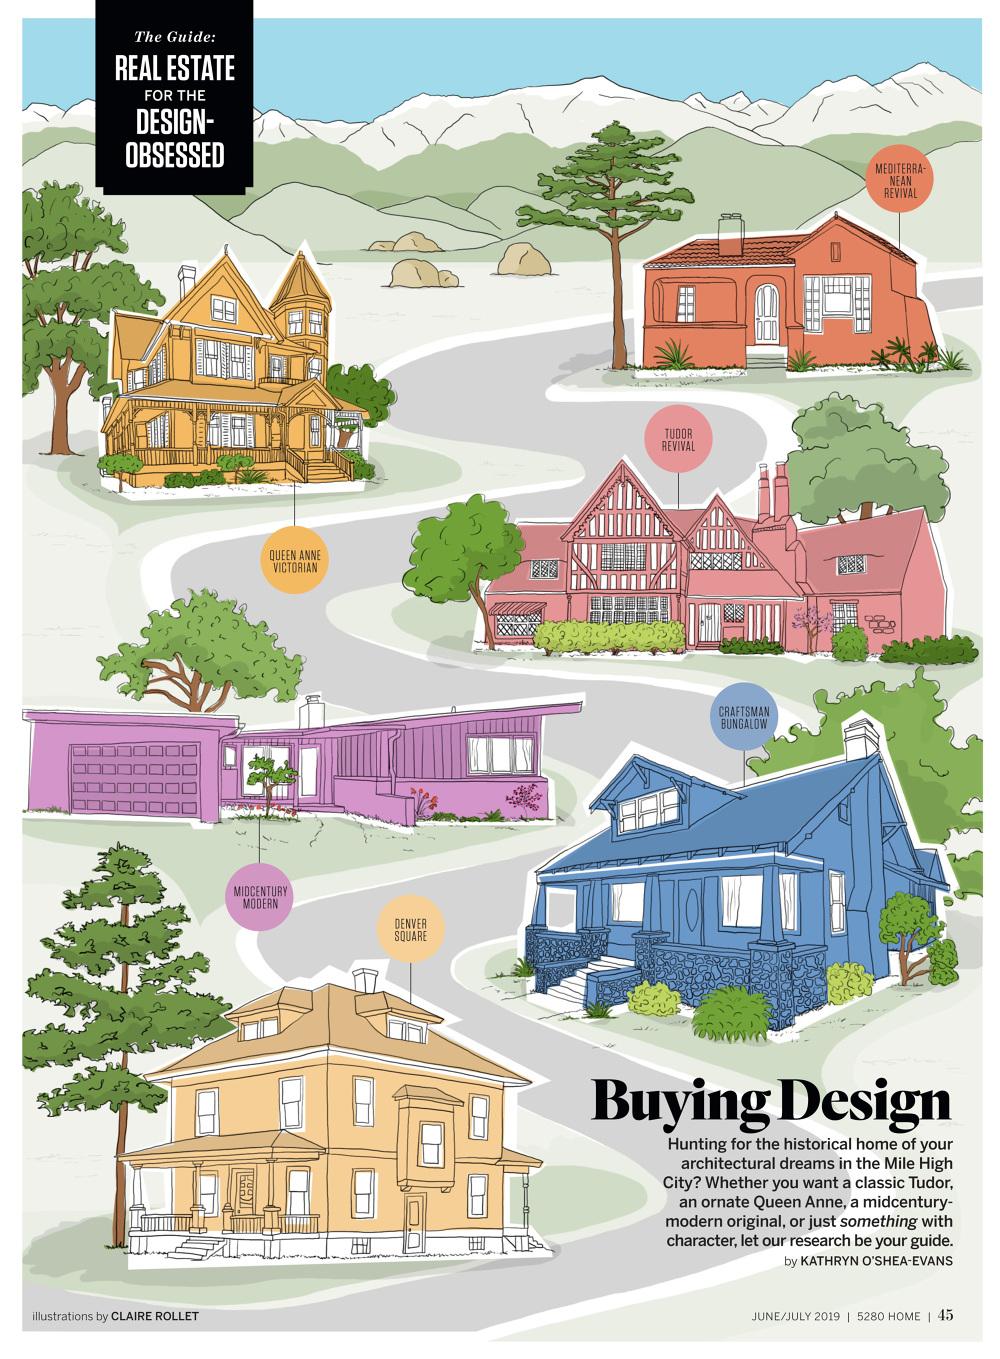 5280 Home magazine - Claire Rollet illustrator